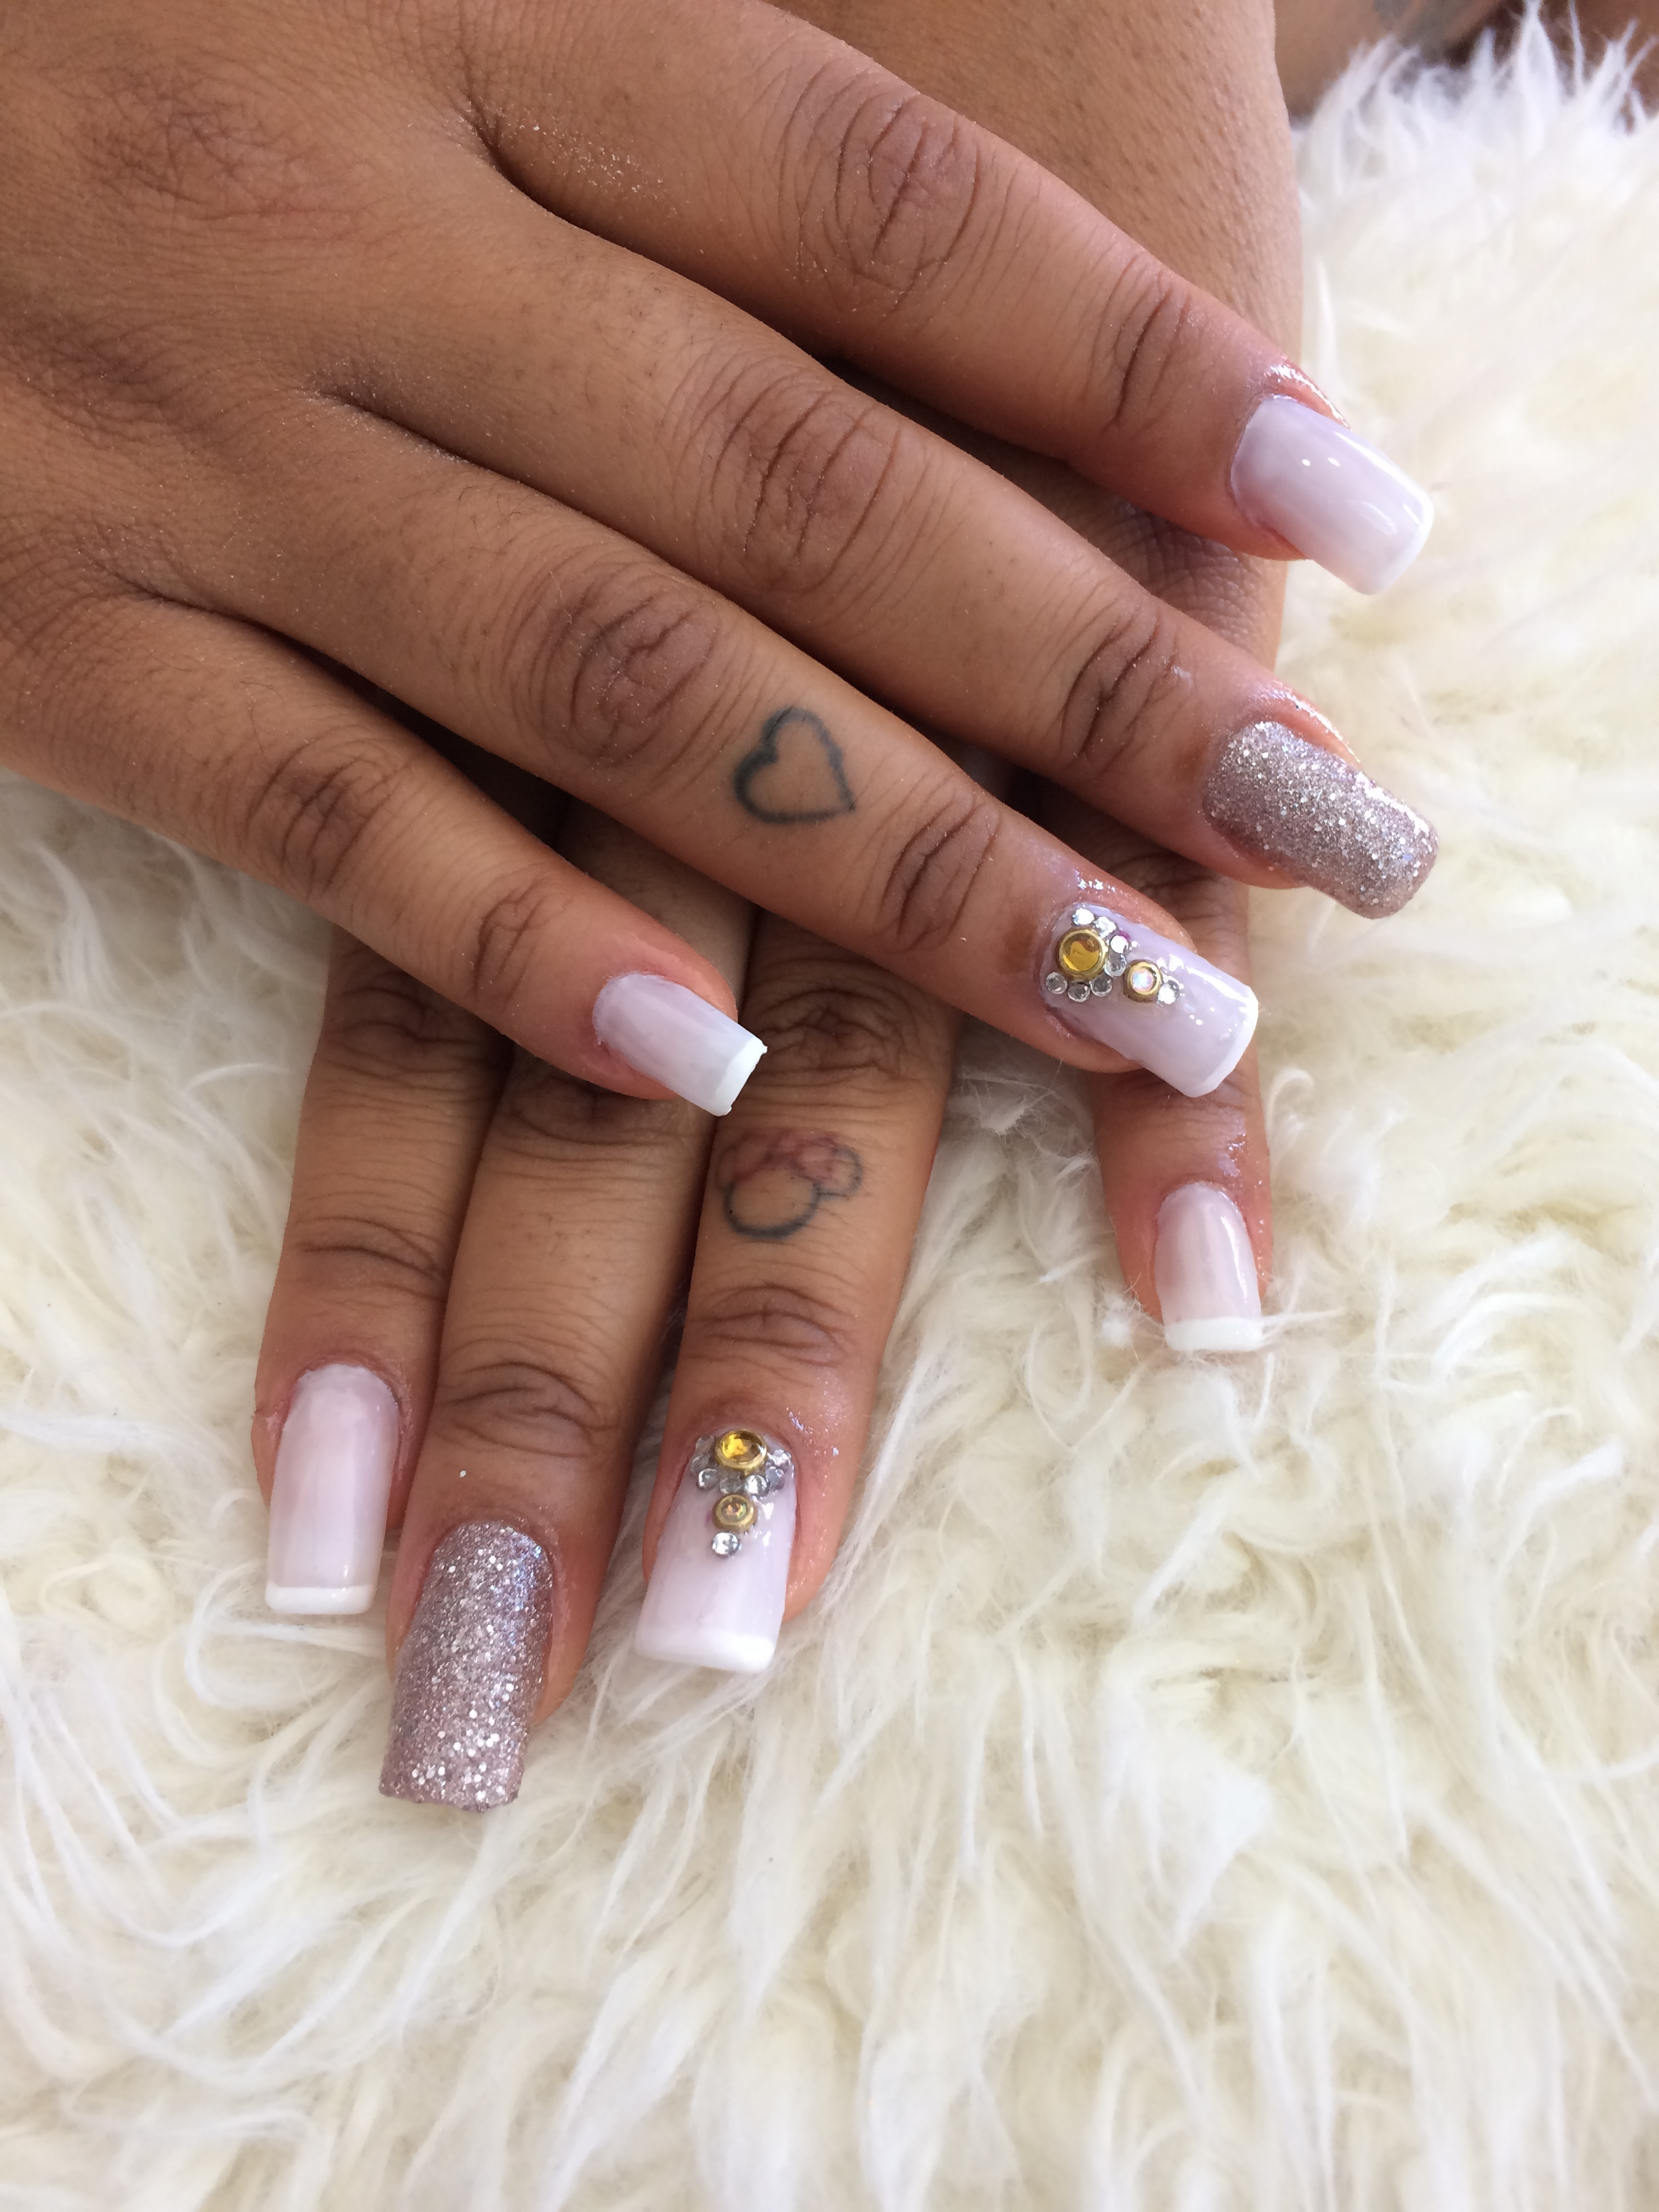 unha estudante (esteticista) manicure e pedicure